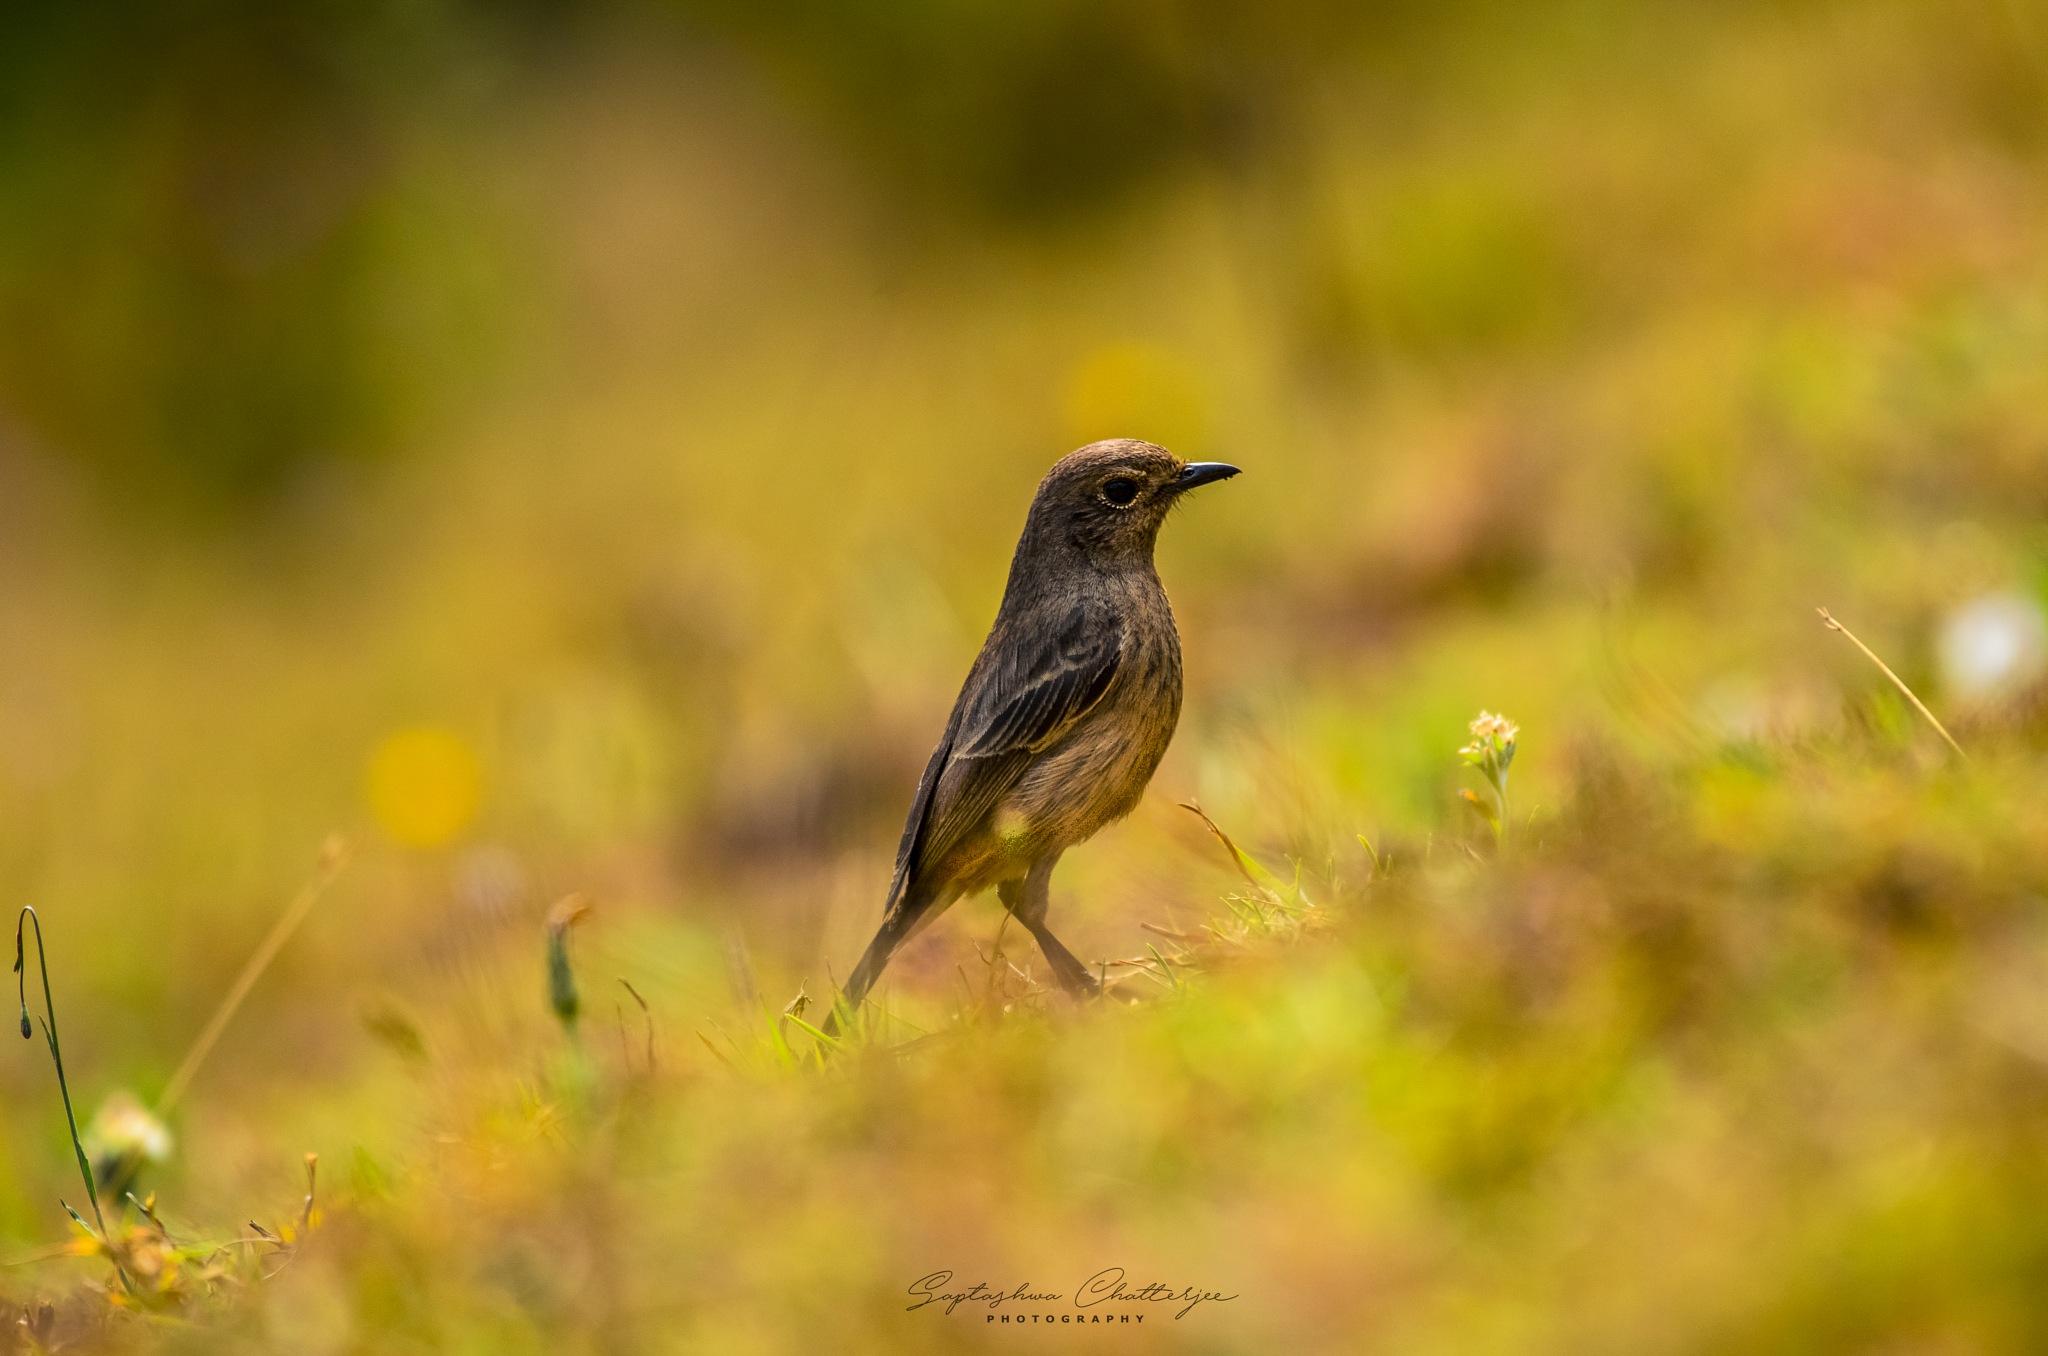 Pied Bushchat Female by Saptashwa Chatterjee